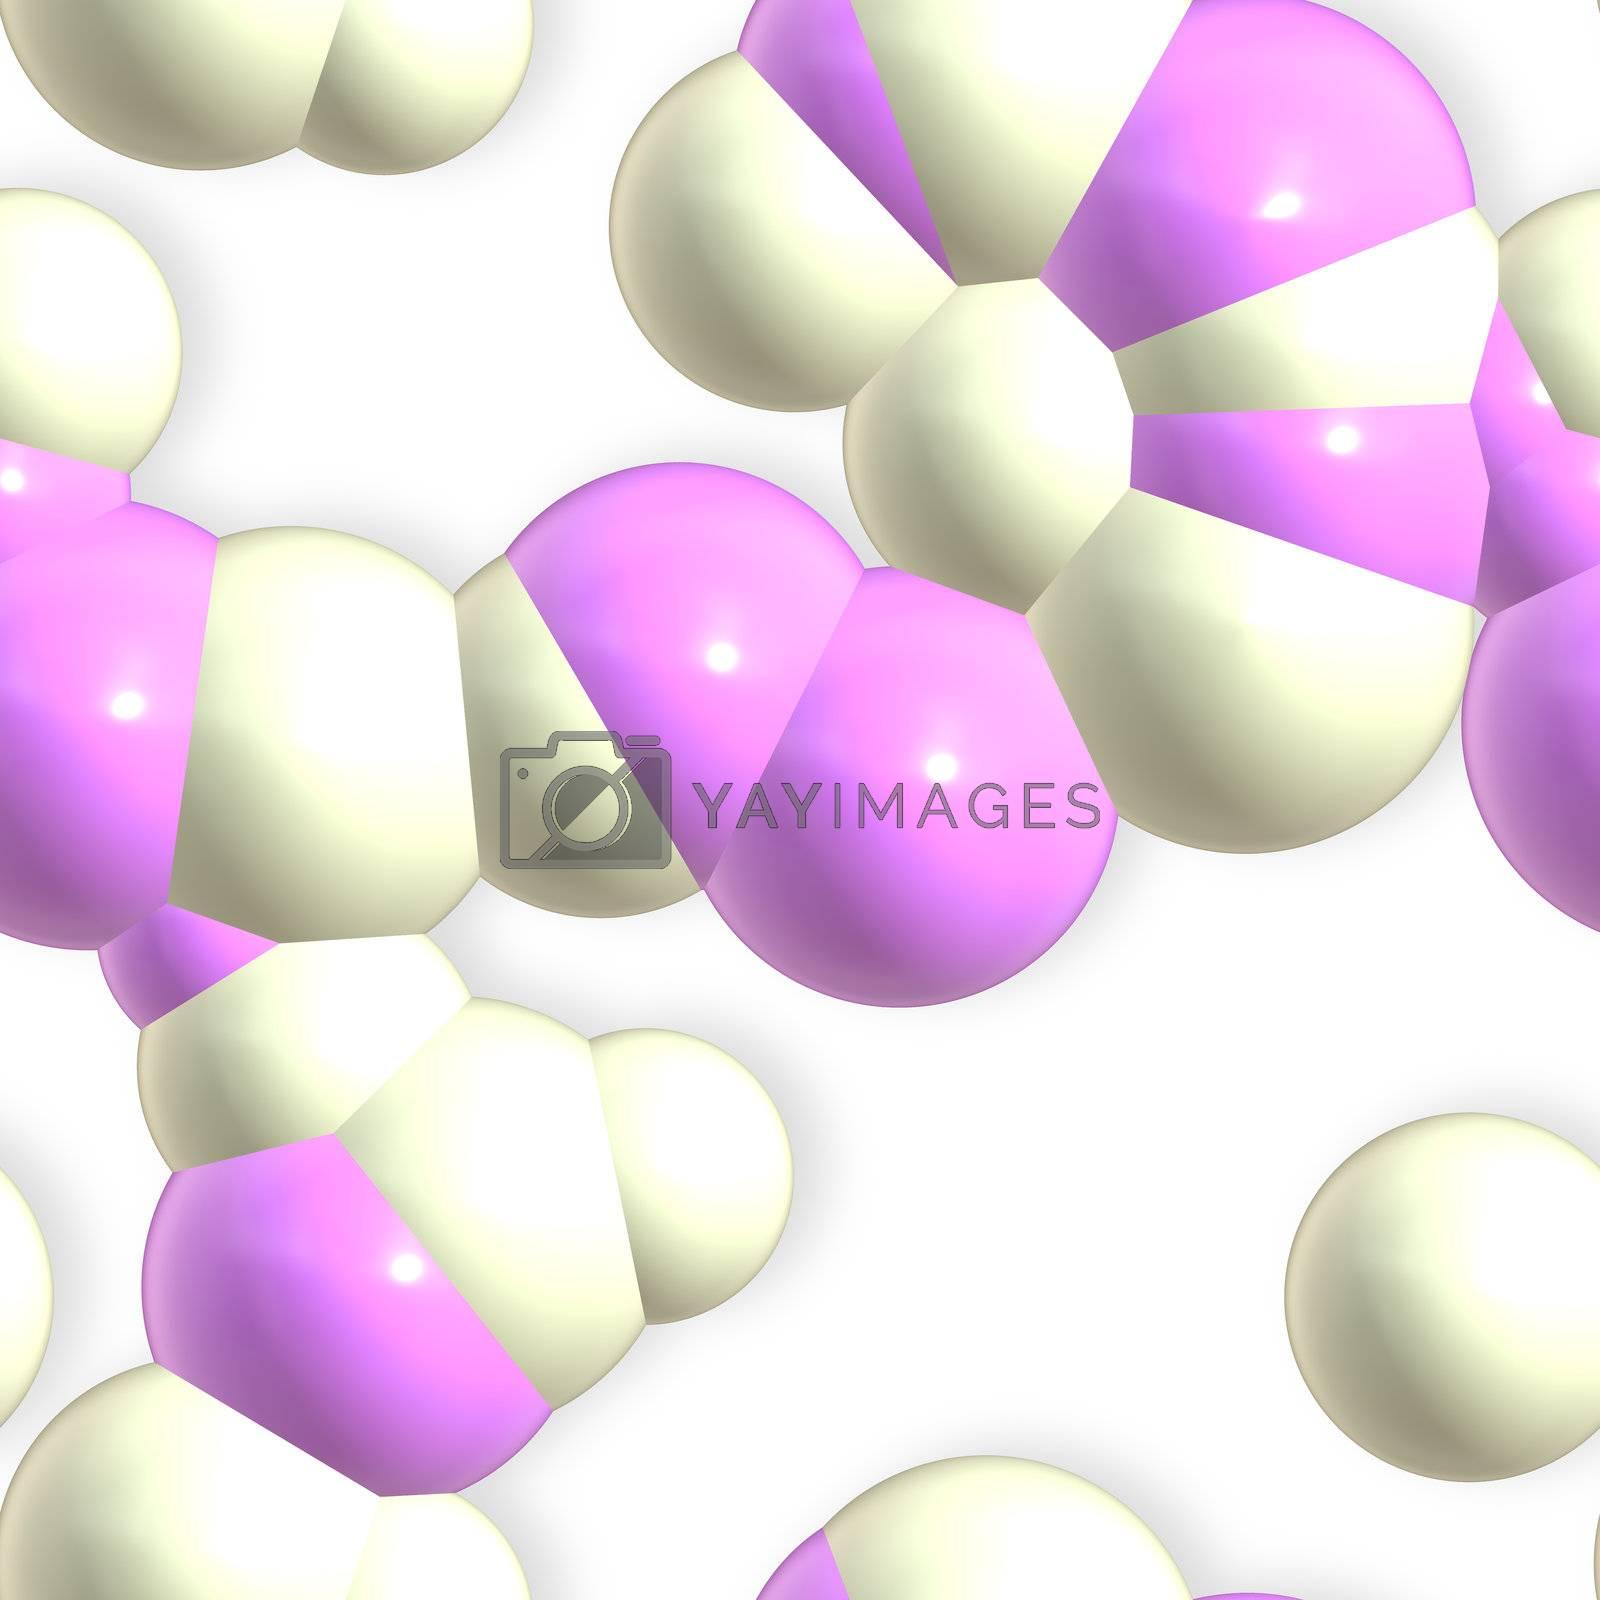 Molecule chemistry atoms background by kgtoh